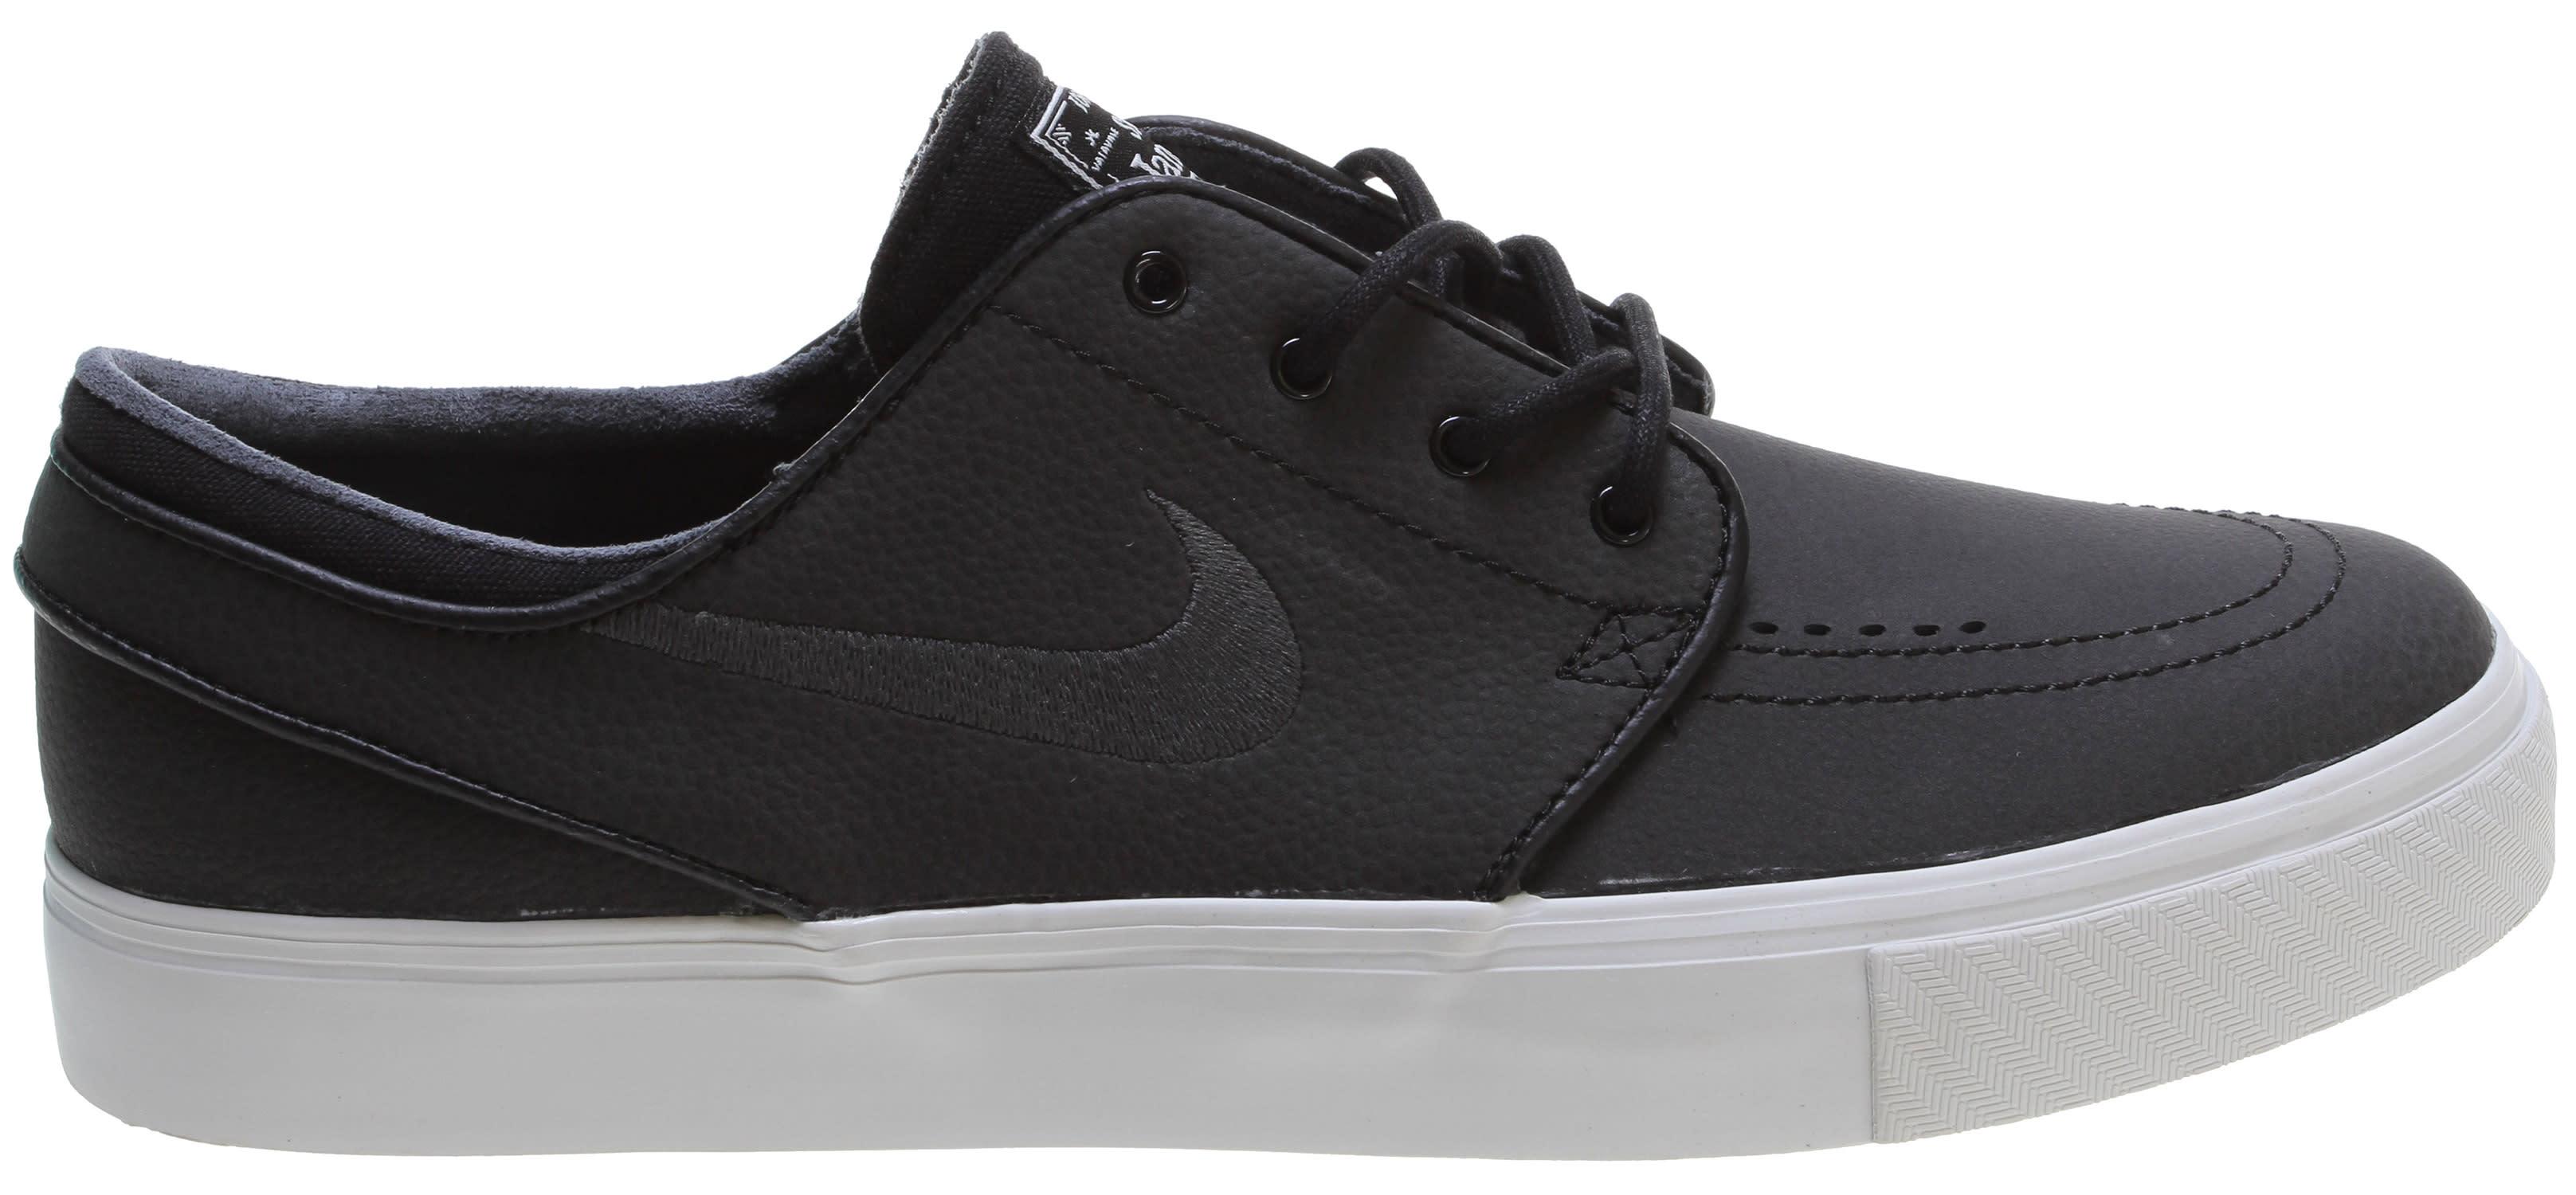 4624ce67ef05 Nike Zoom Stefan Janoski Leather Shoes - thumbnail 1